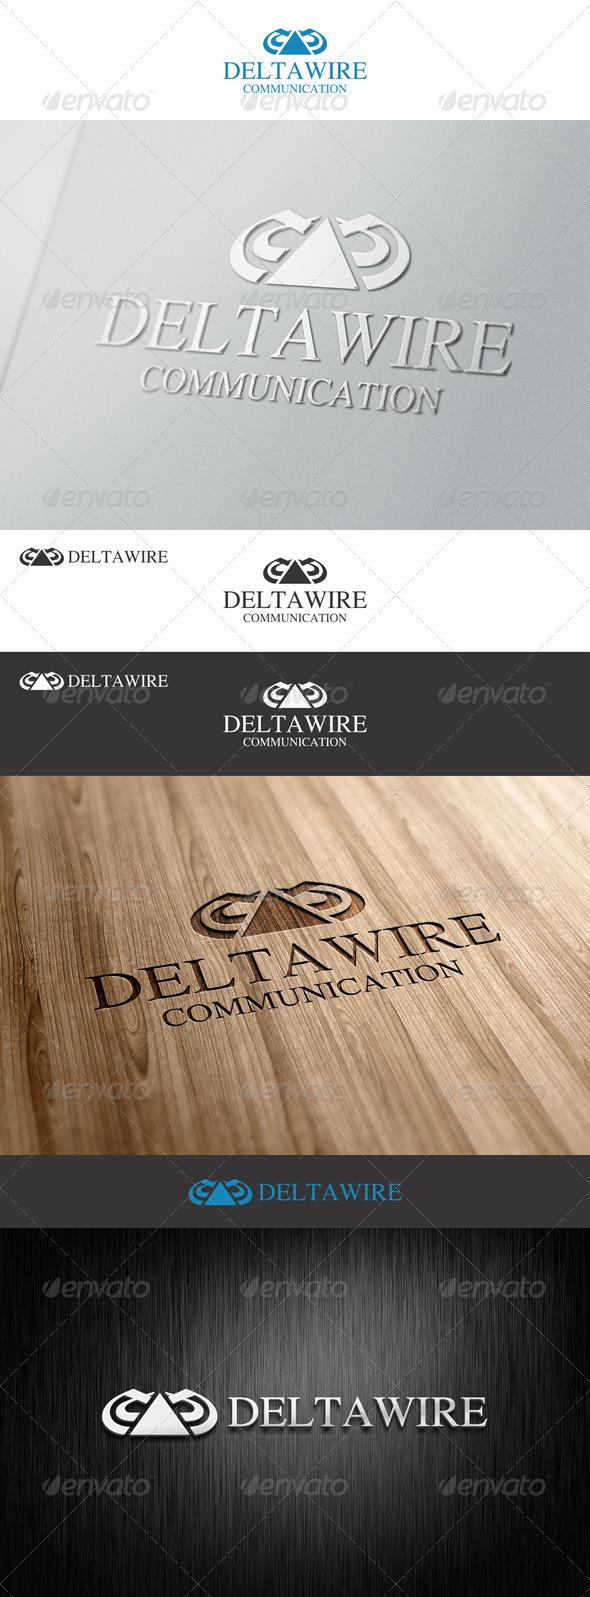 Delta Wire Communication Logo